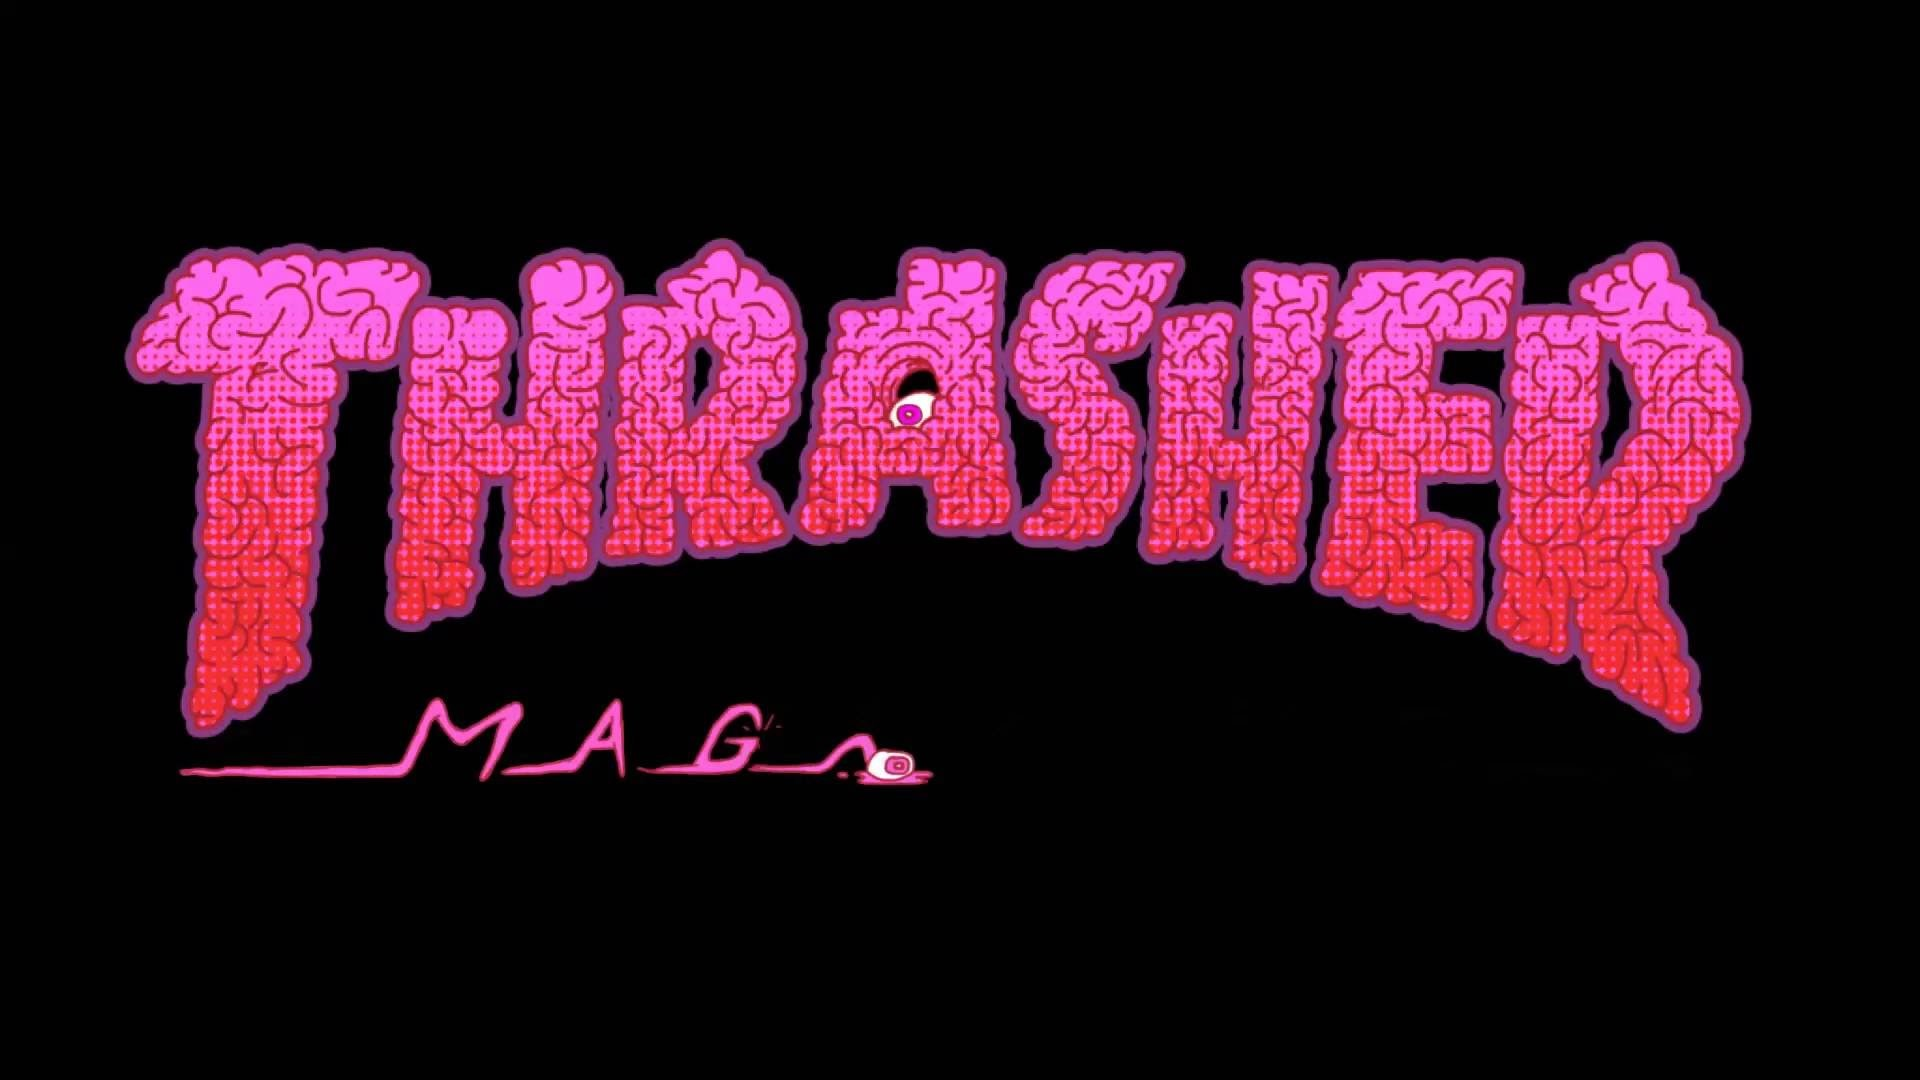 Girl Skateboards Wallpaper Hd Thrasher Logo Wallpapers 183 ① Wallpapertag